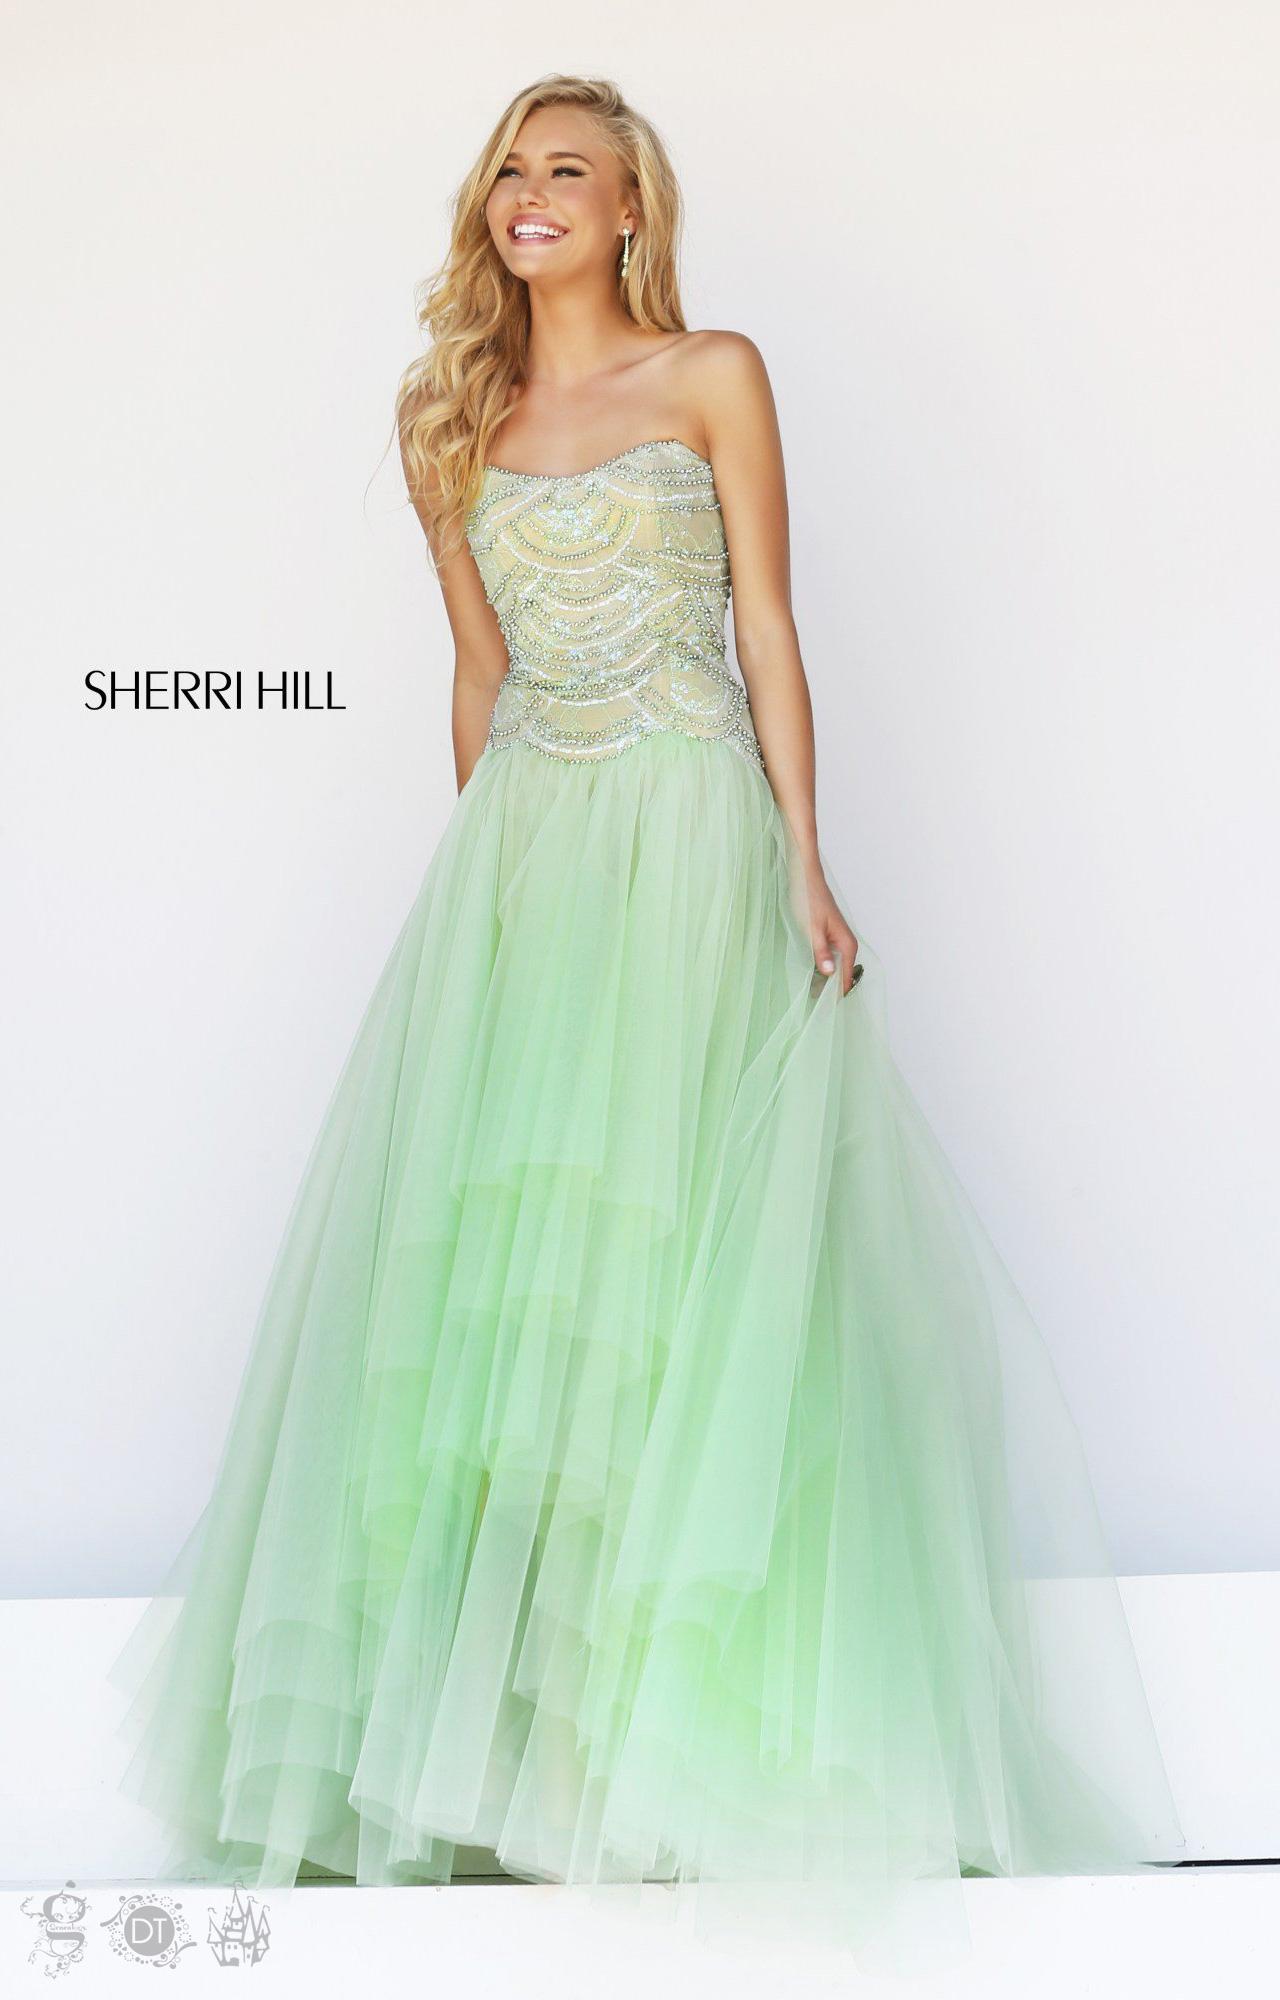 Sherri Hill 11082 Green Prom Dress 2014 [Sherri Hill 11082] - $188.00 : Prom Dresses On Sale,Discover 2014 Dresses For Prom